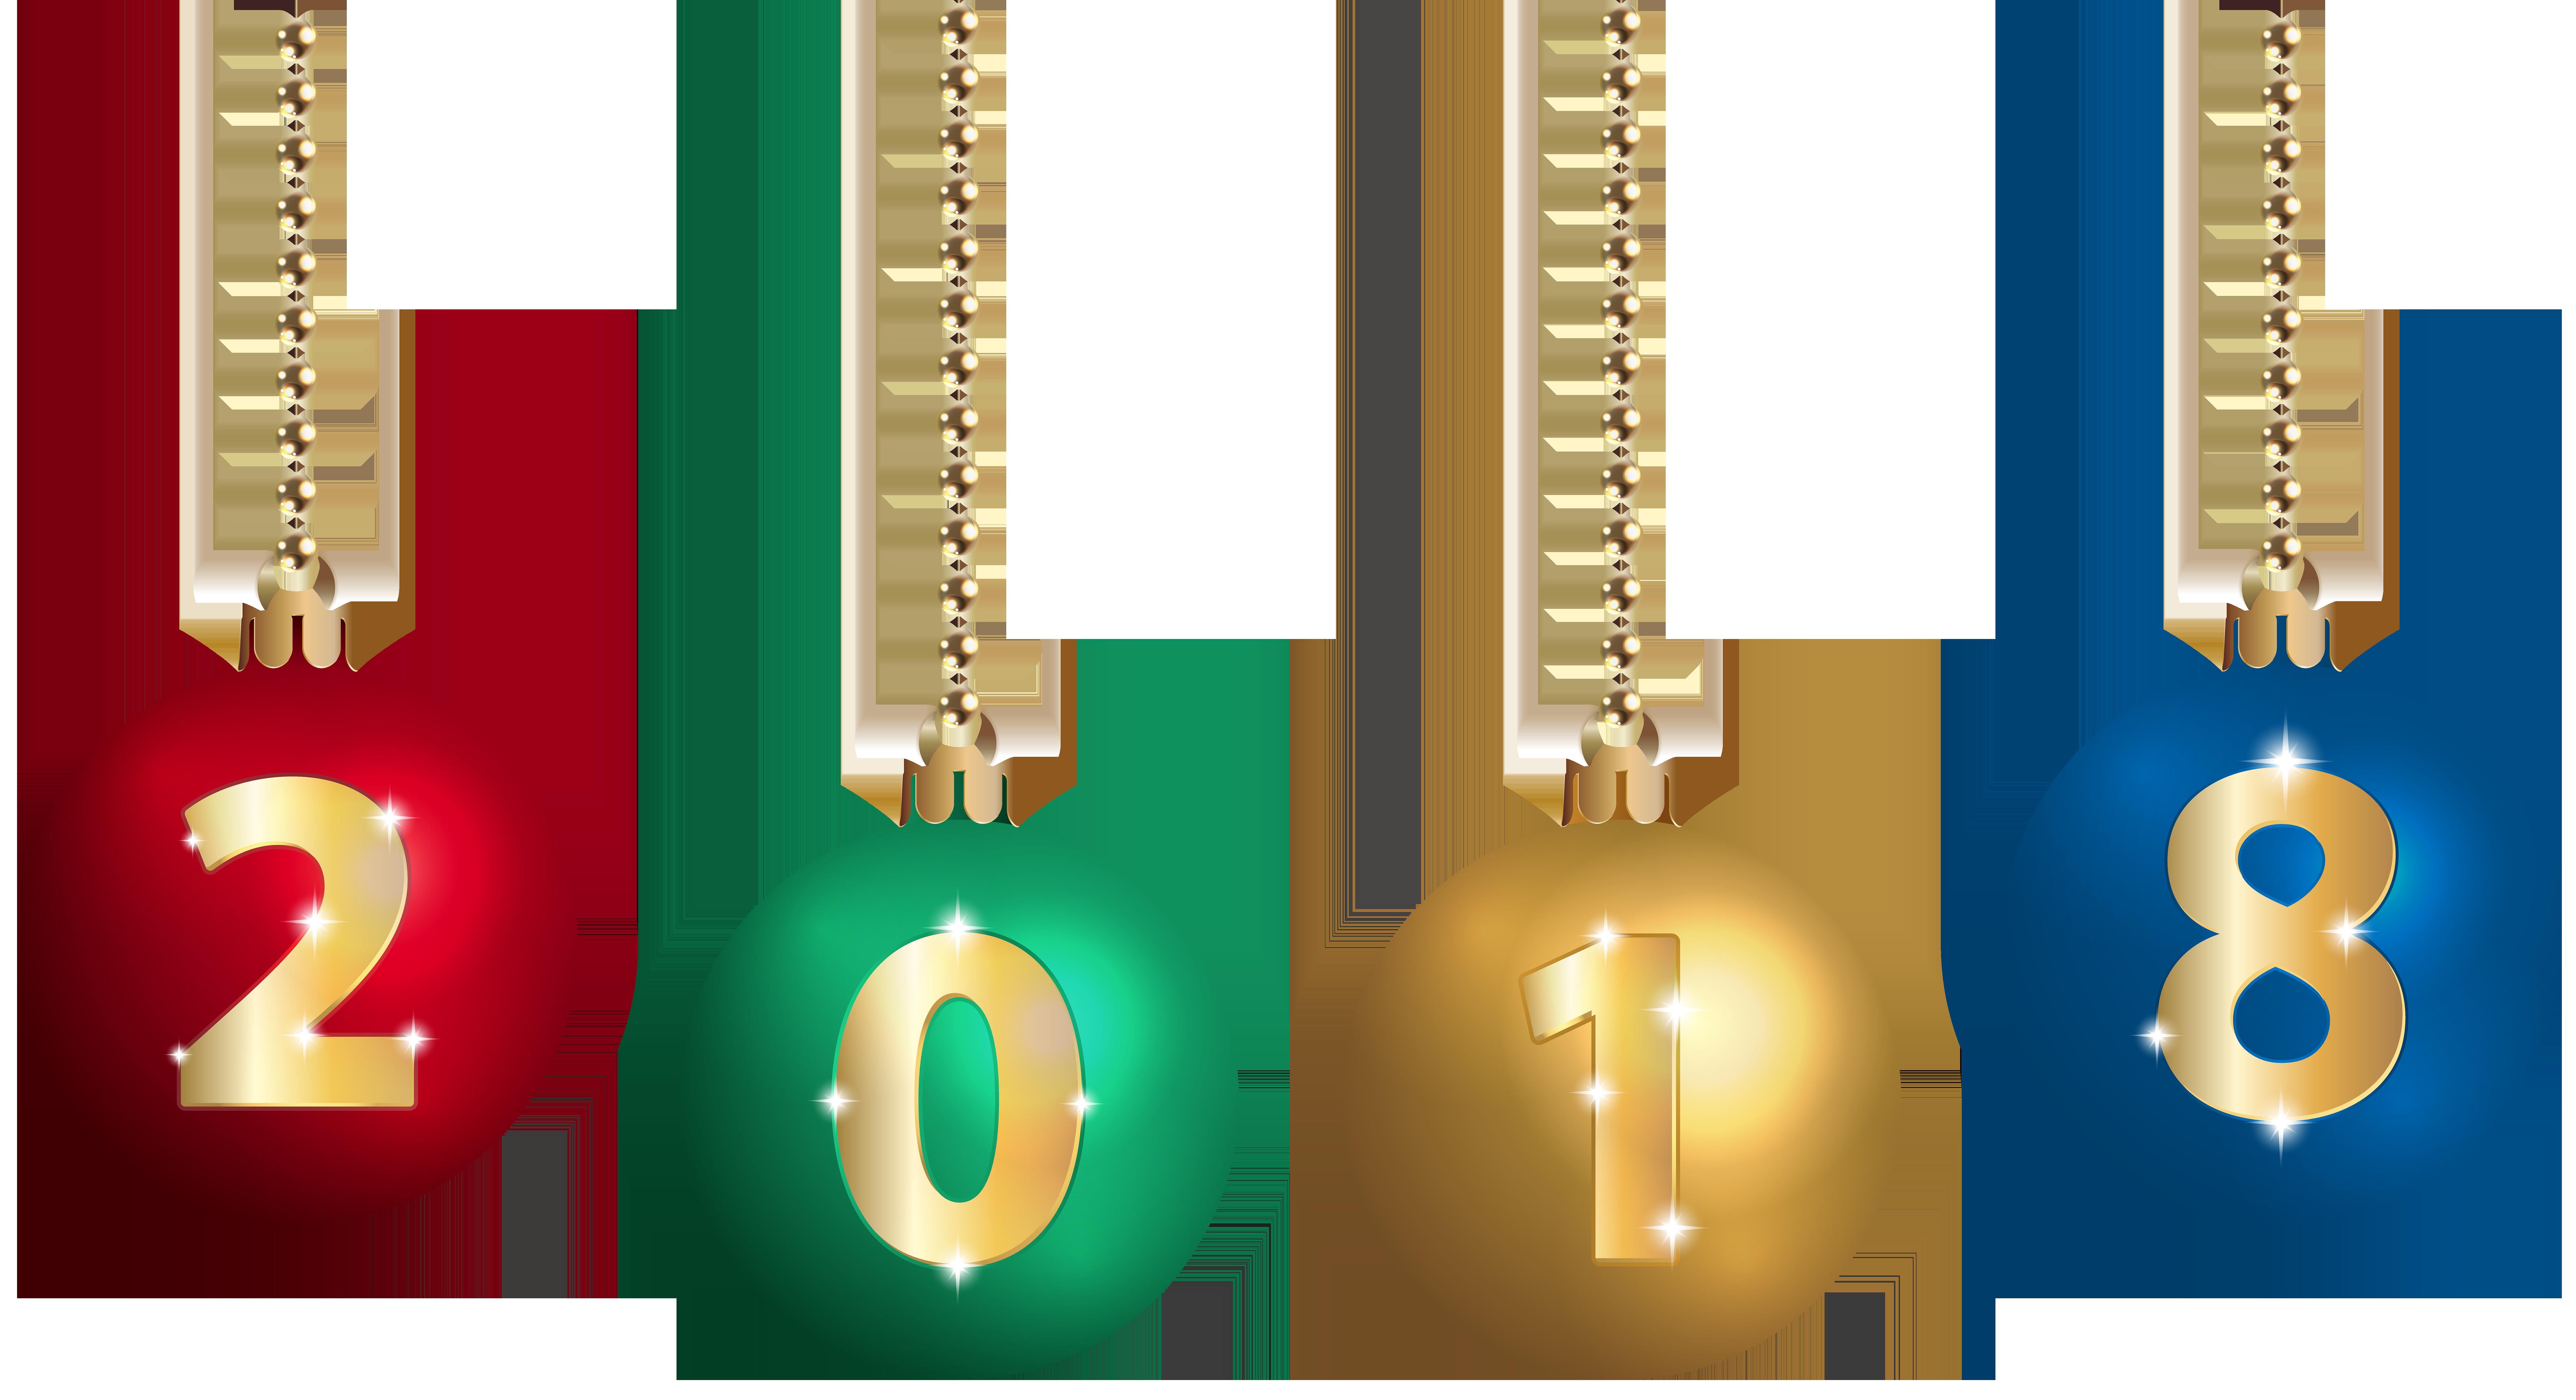 Christmas 2018 clipart